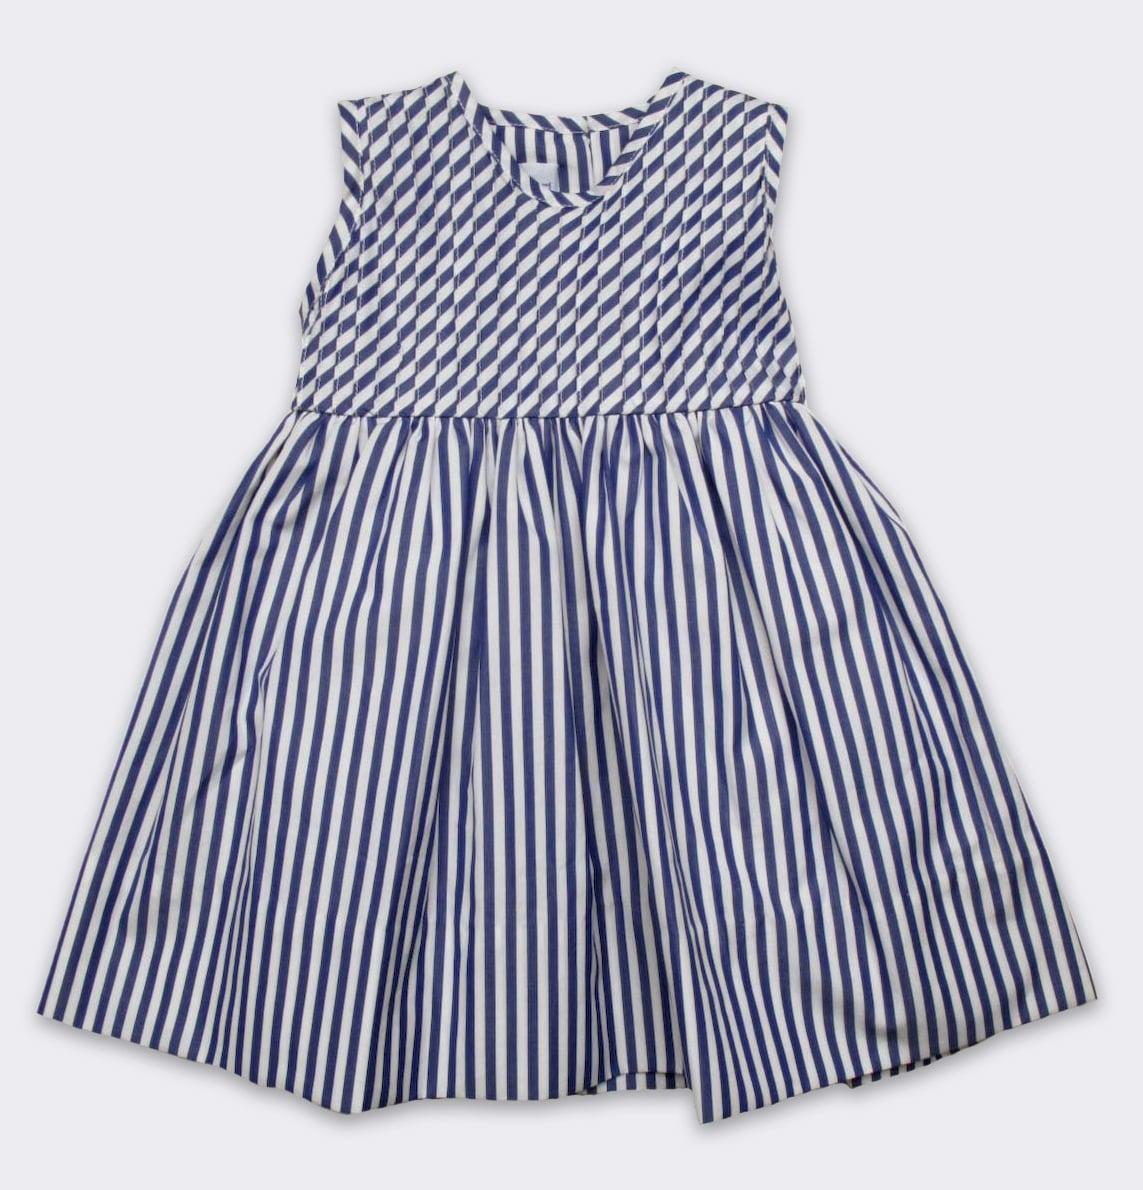 Baby CZ Striped Pintuck Dress